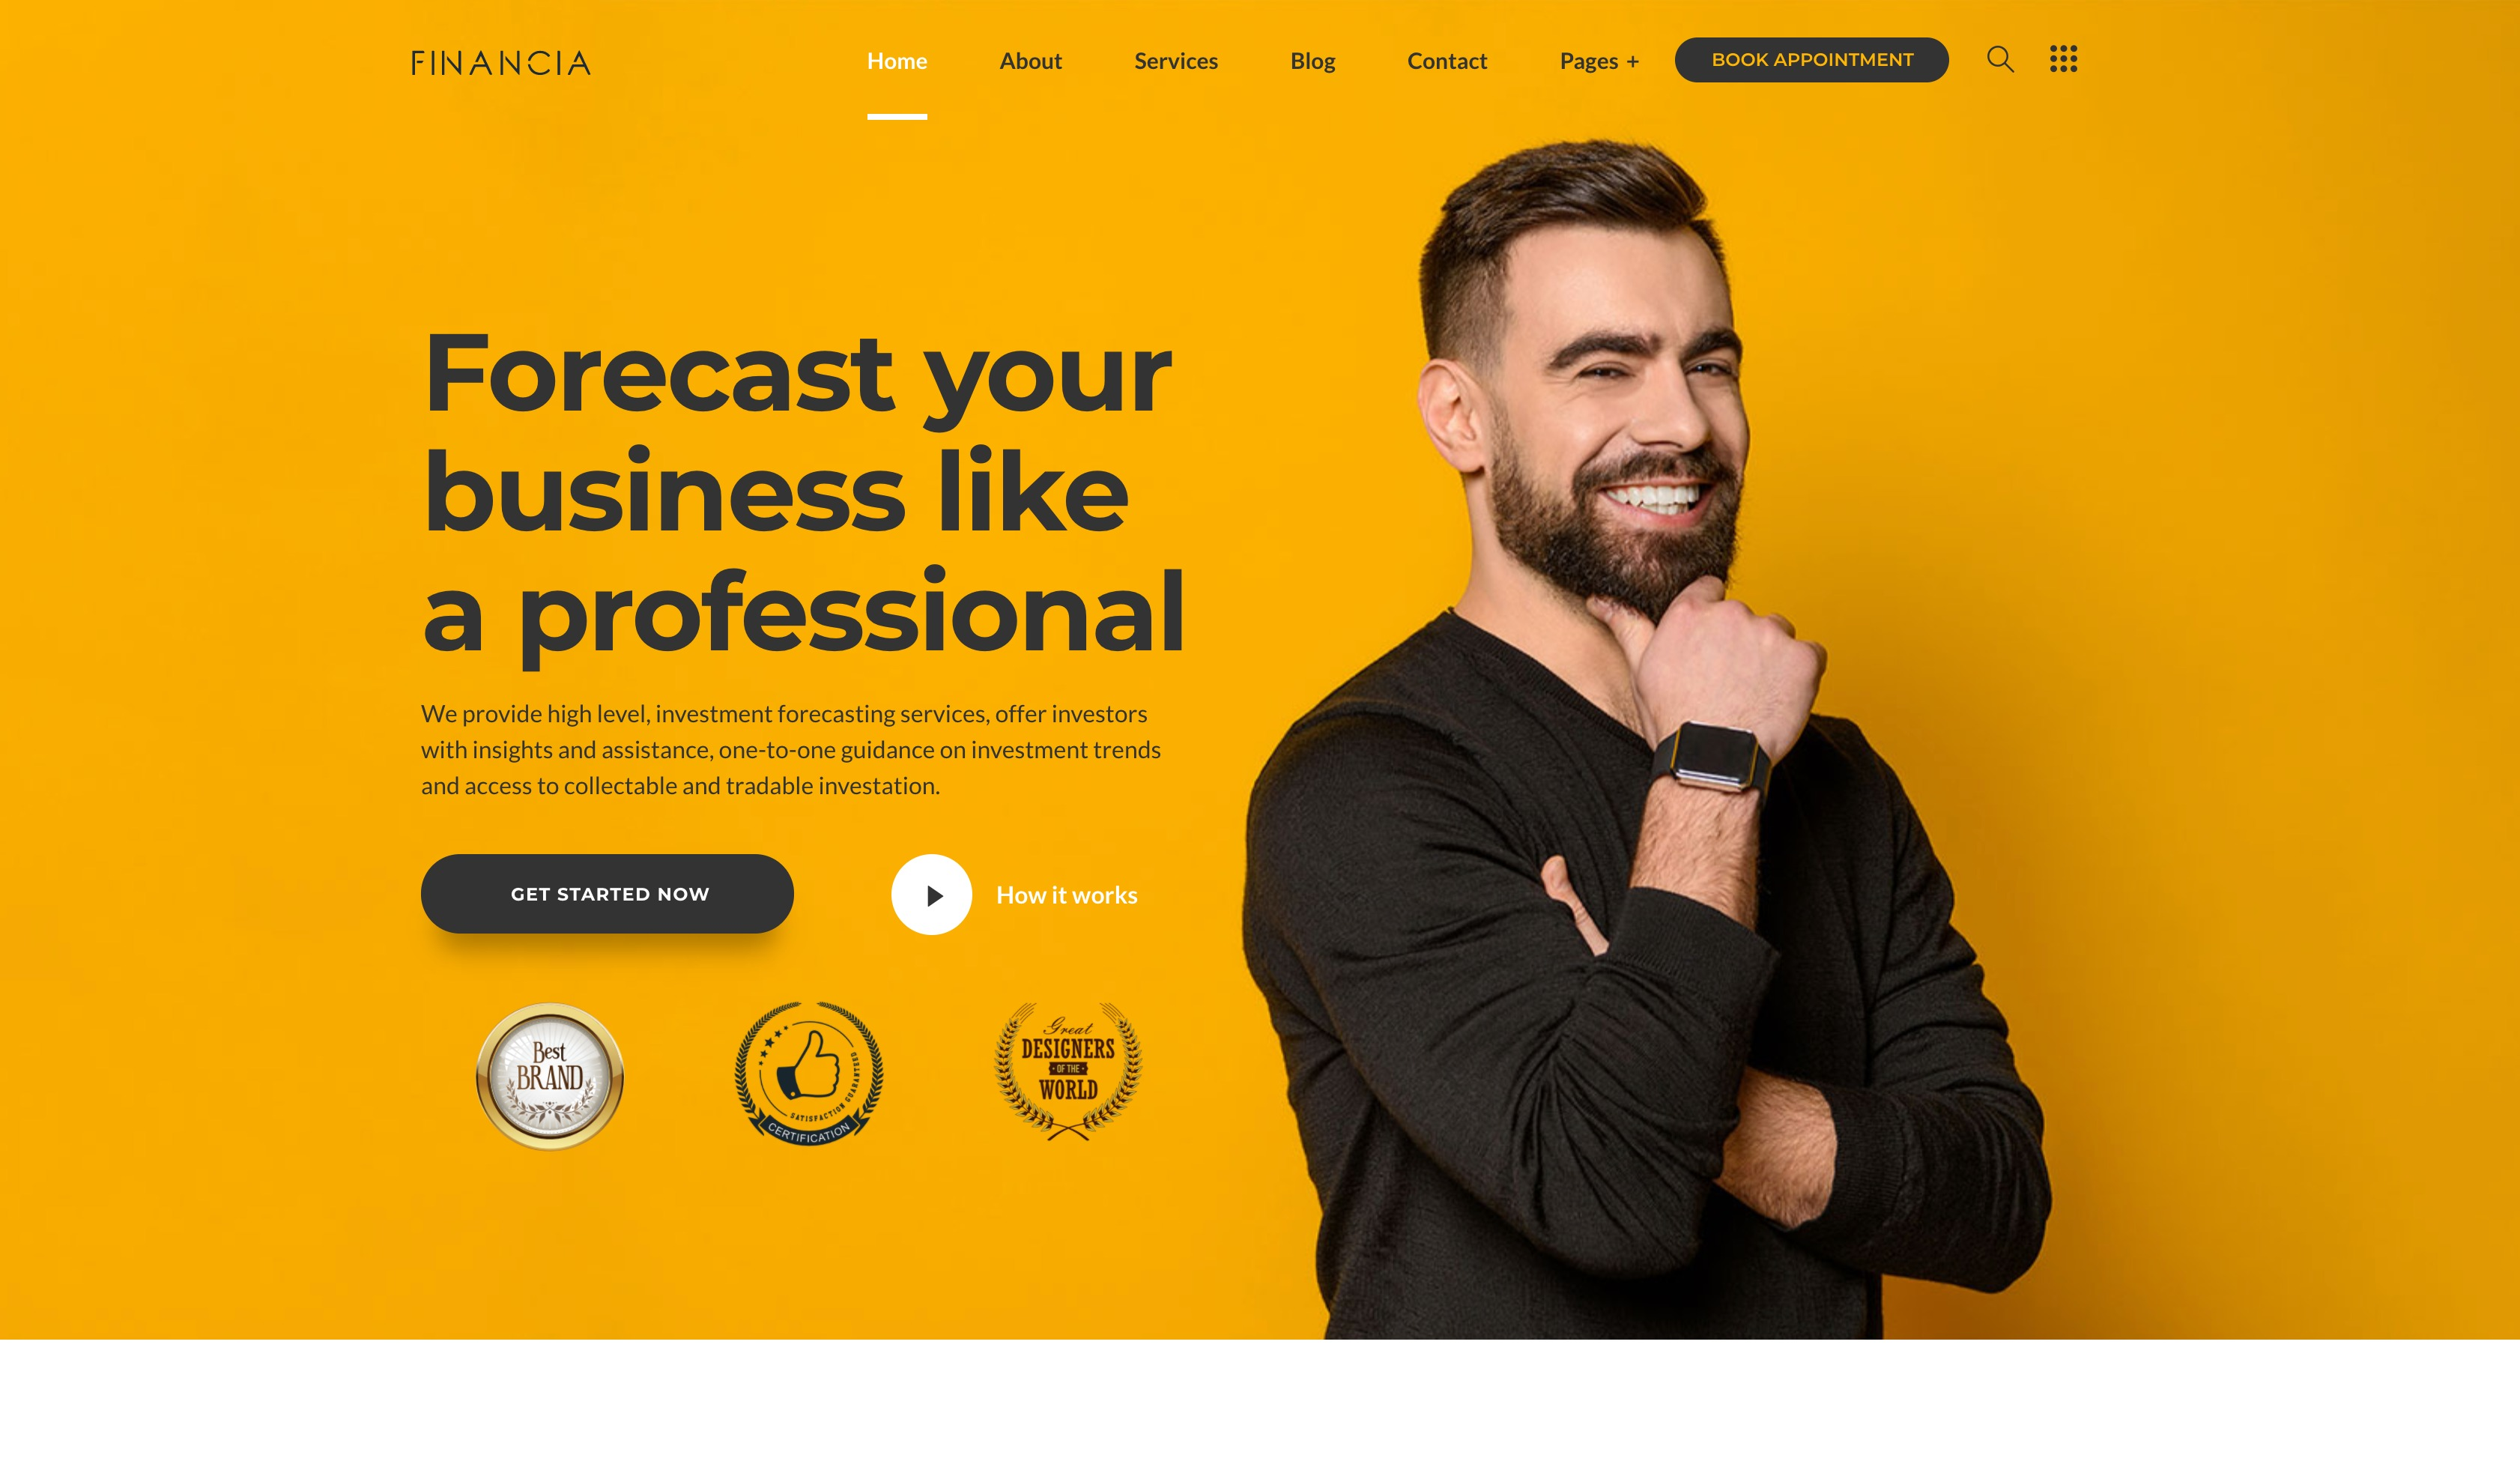 Financia-报税金融财务记账WordPress主题